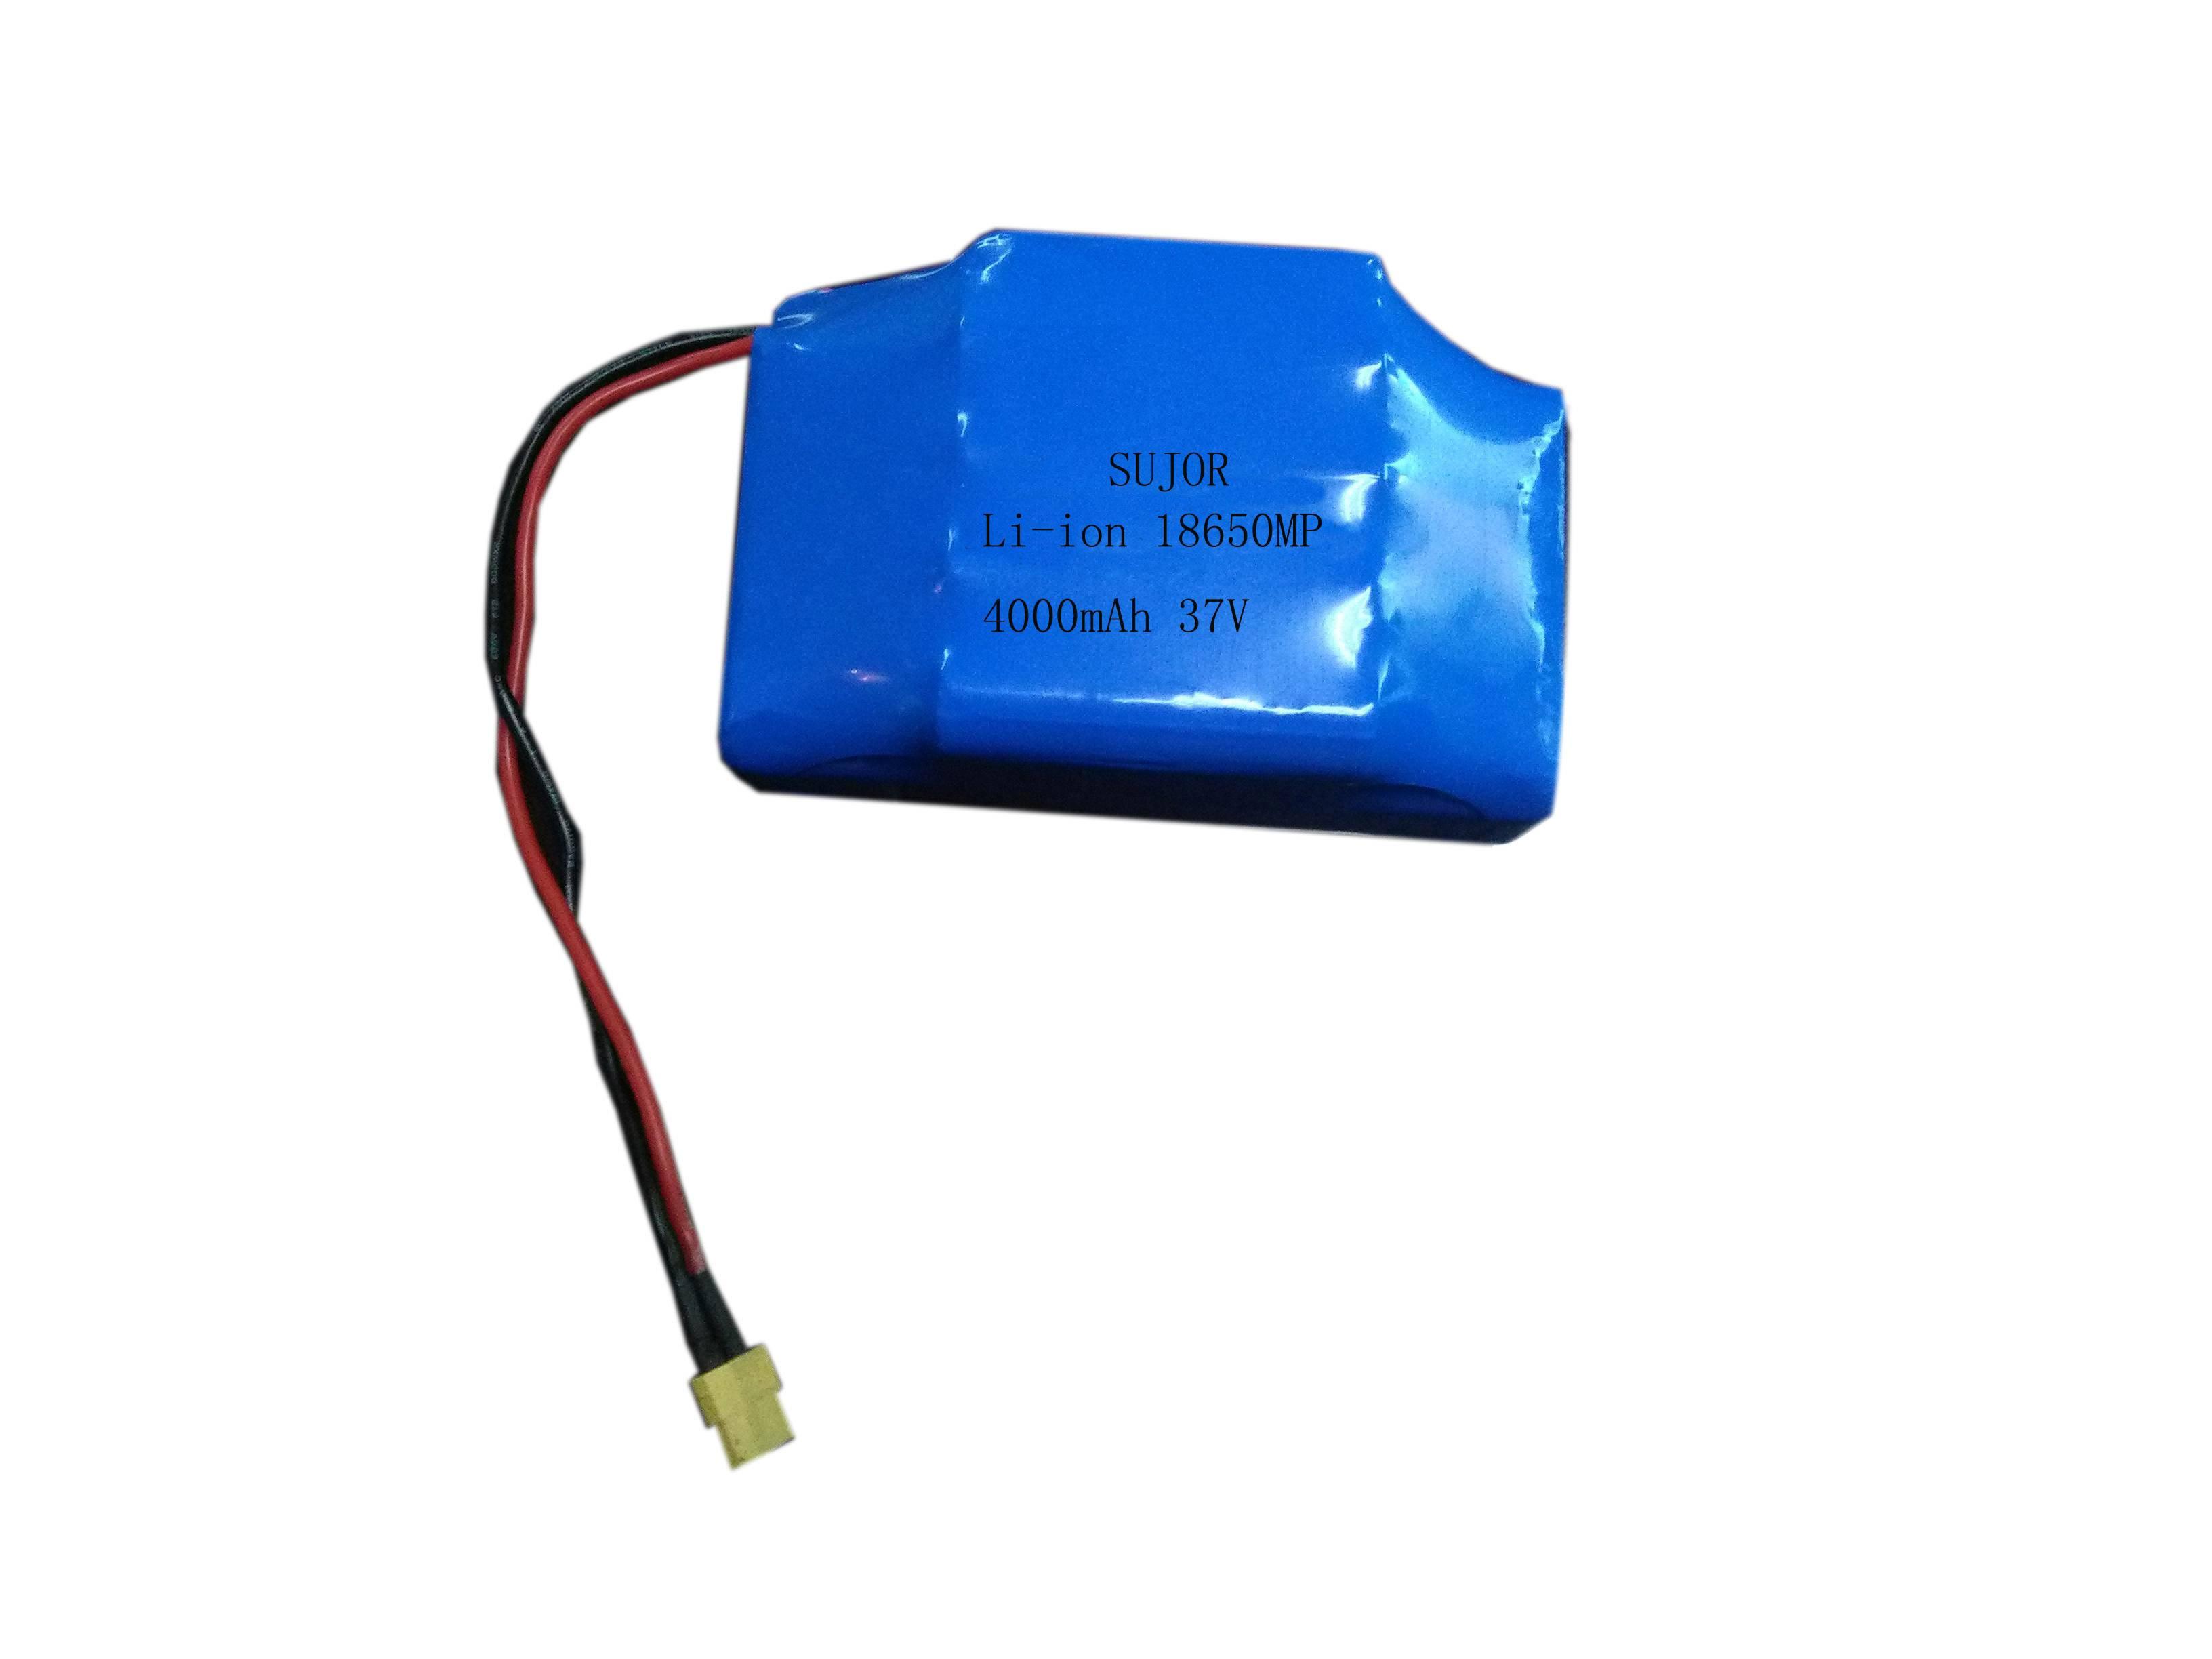 E-bike battery pack lithium ion 37V 18650MP 4000mAh